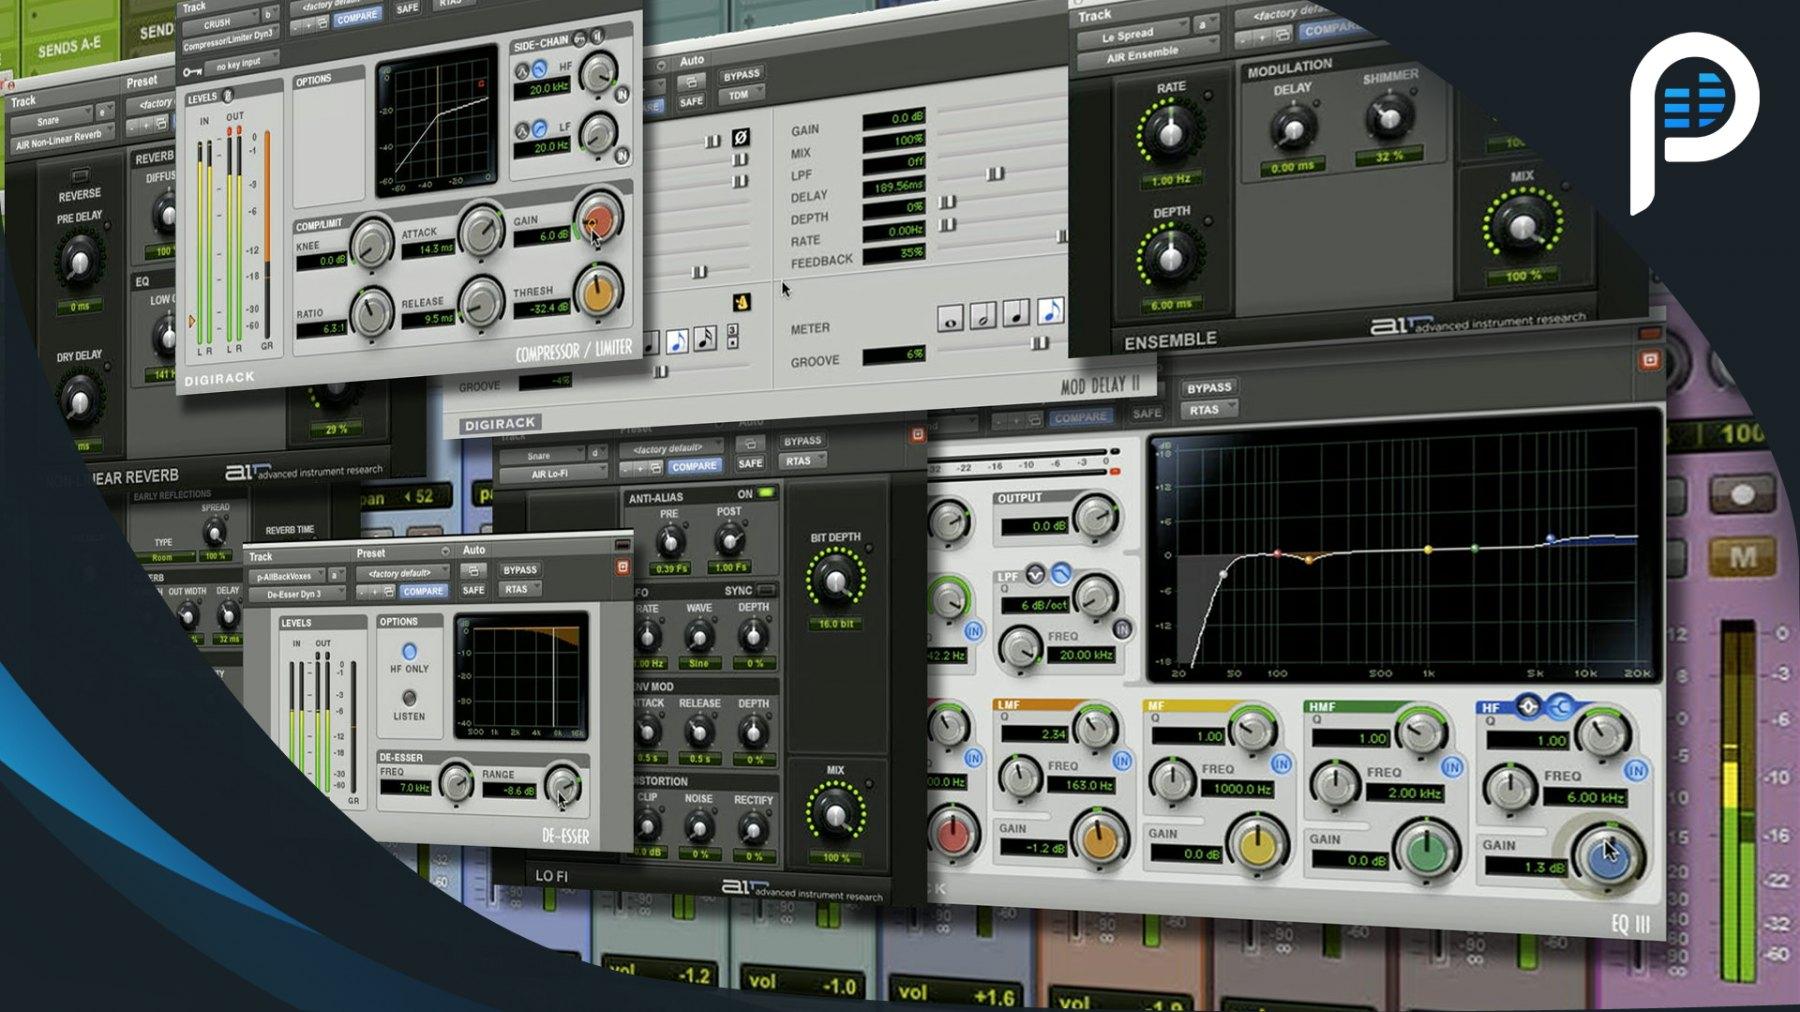 tabla loops free download for fl studio